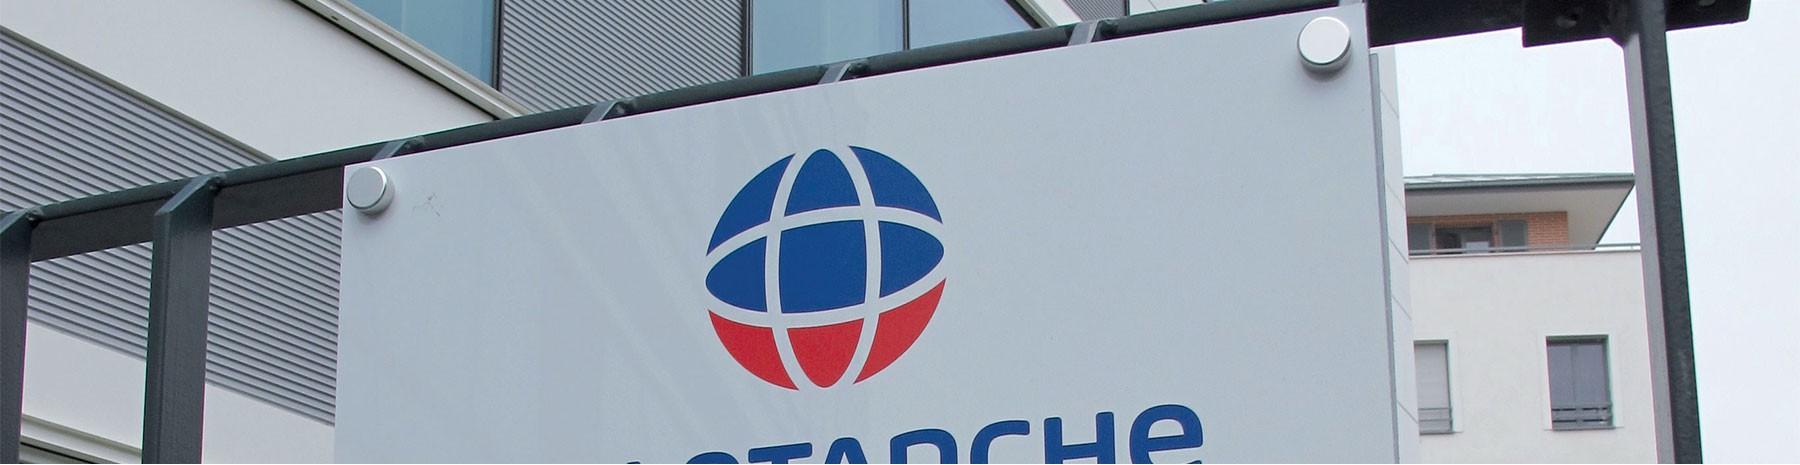 Screw Cover Cap of Altumis manufacture for sign